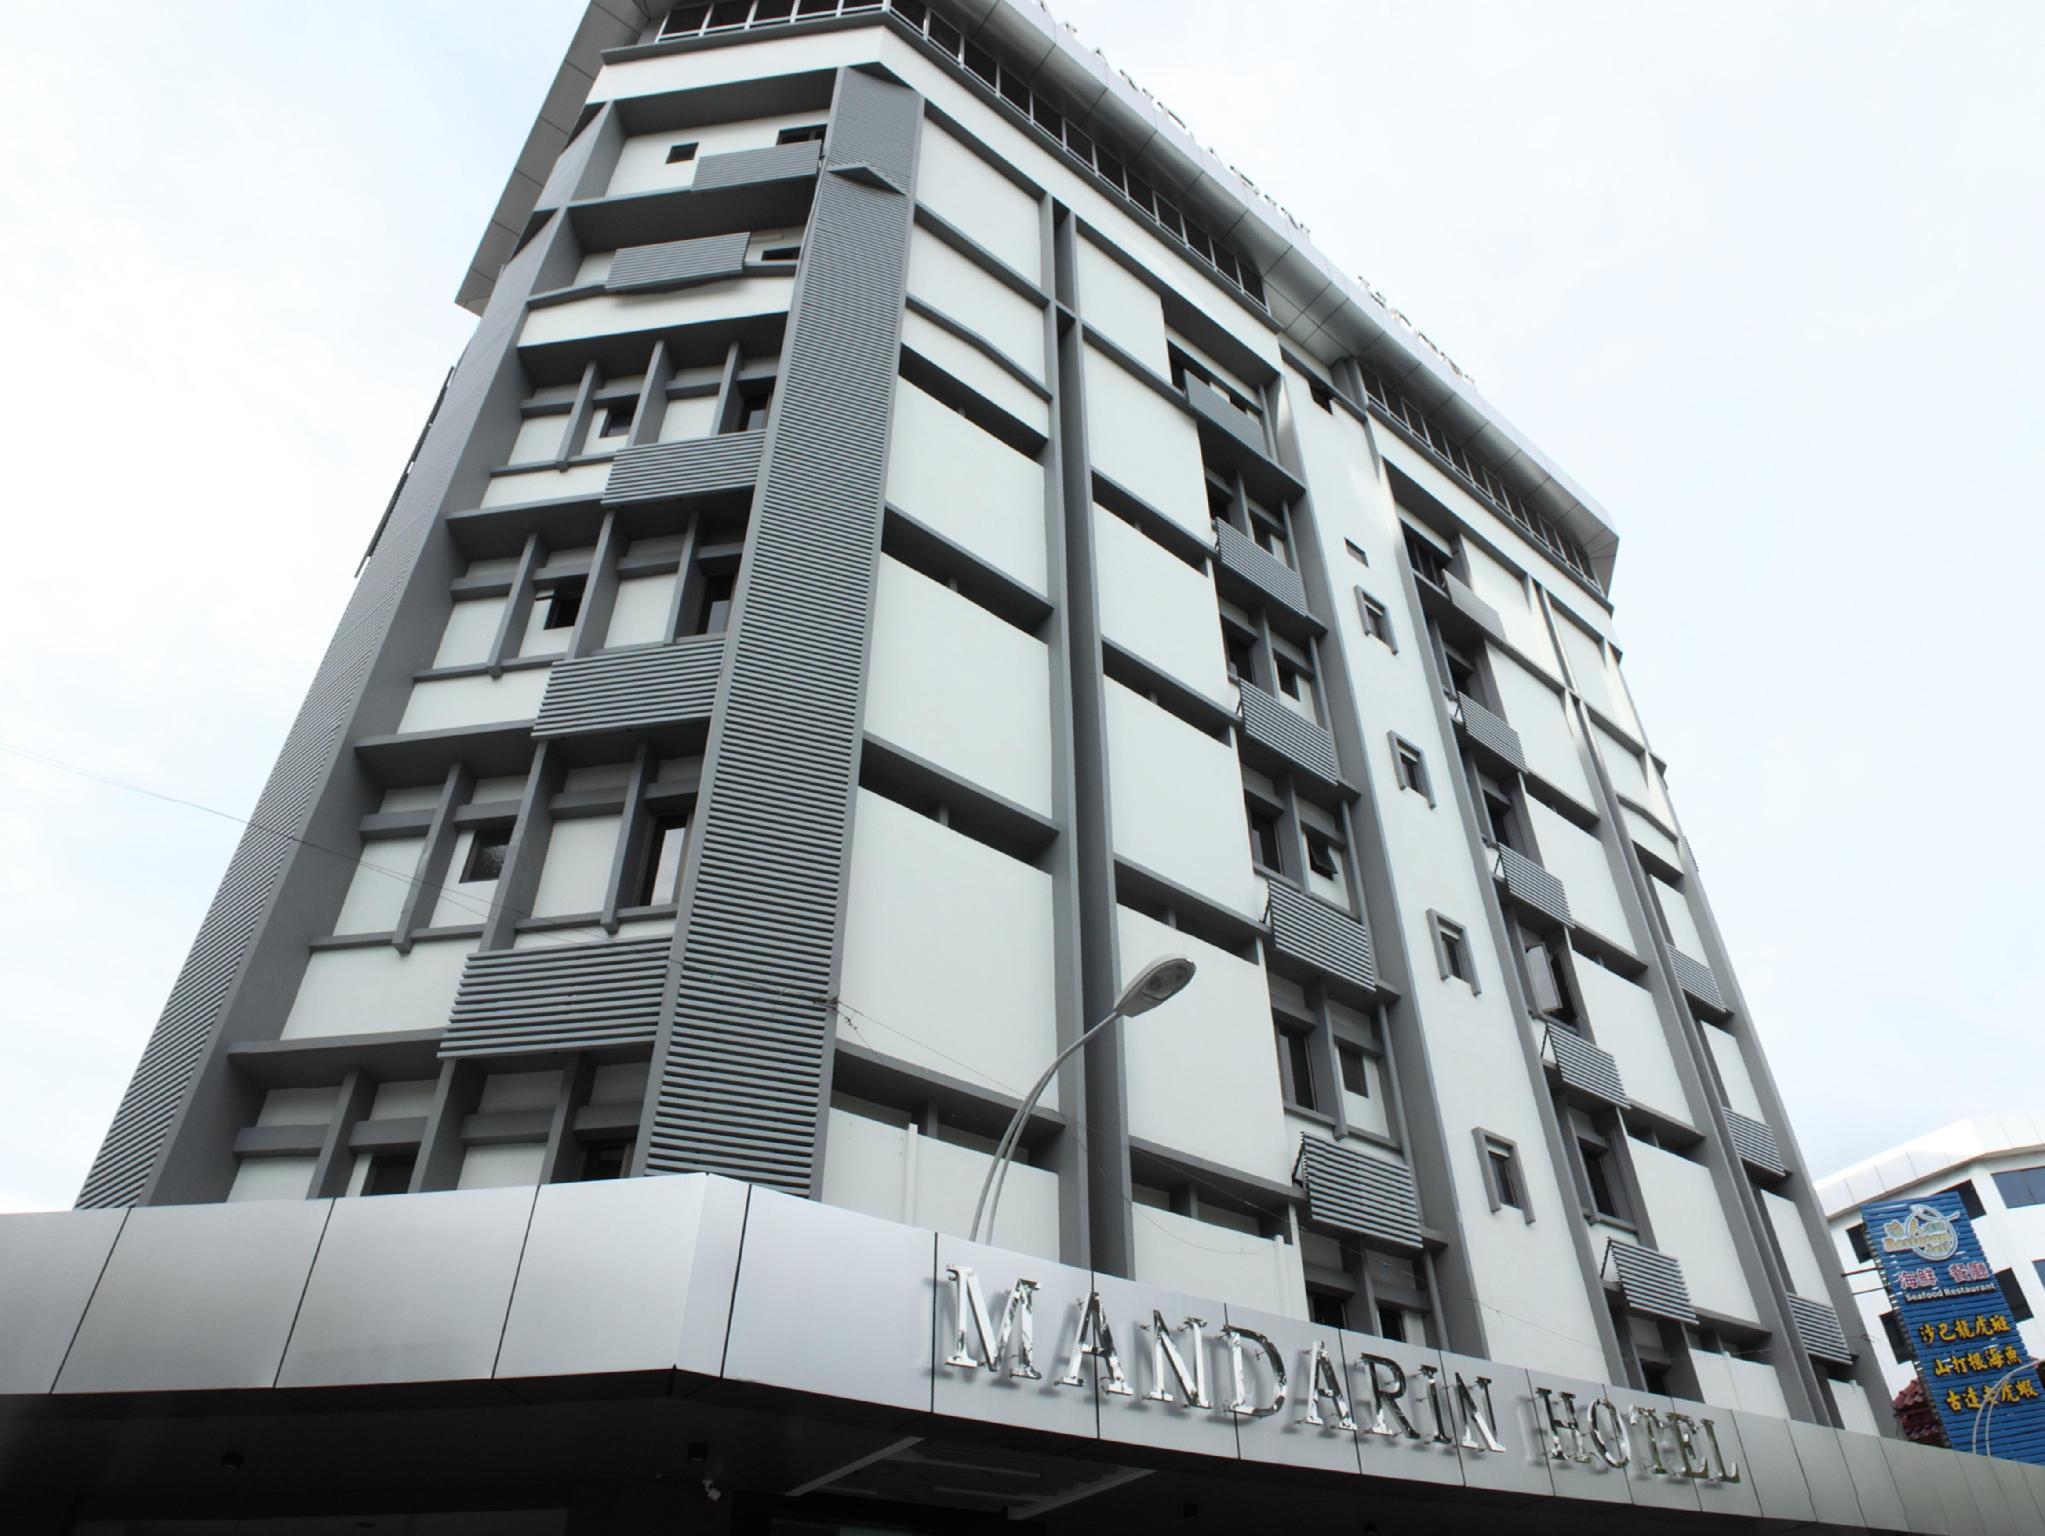 Mandarin Hotel - Kota Kinabalu